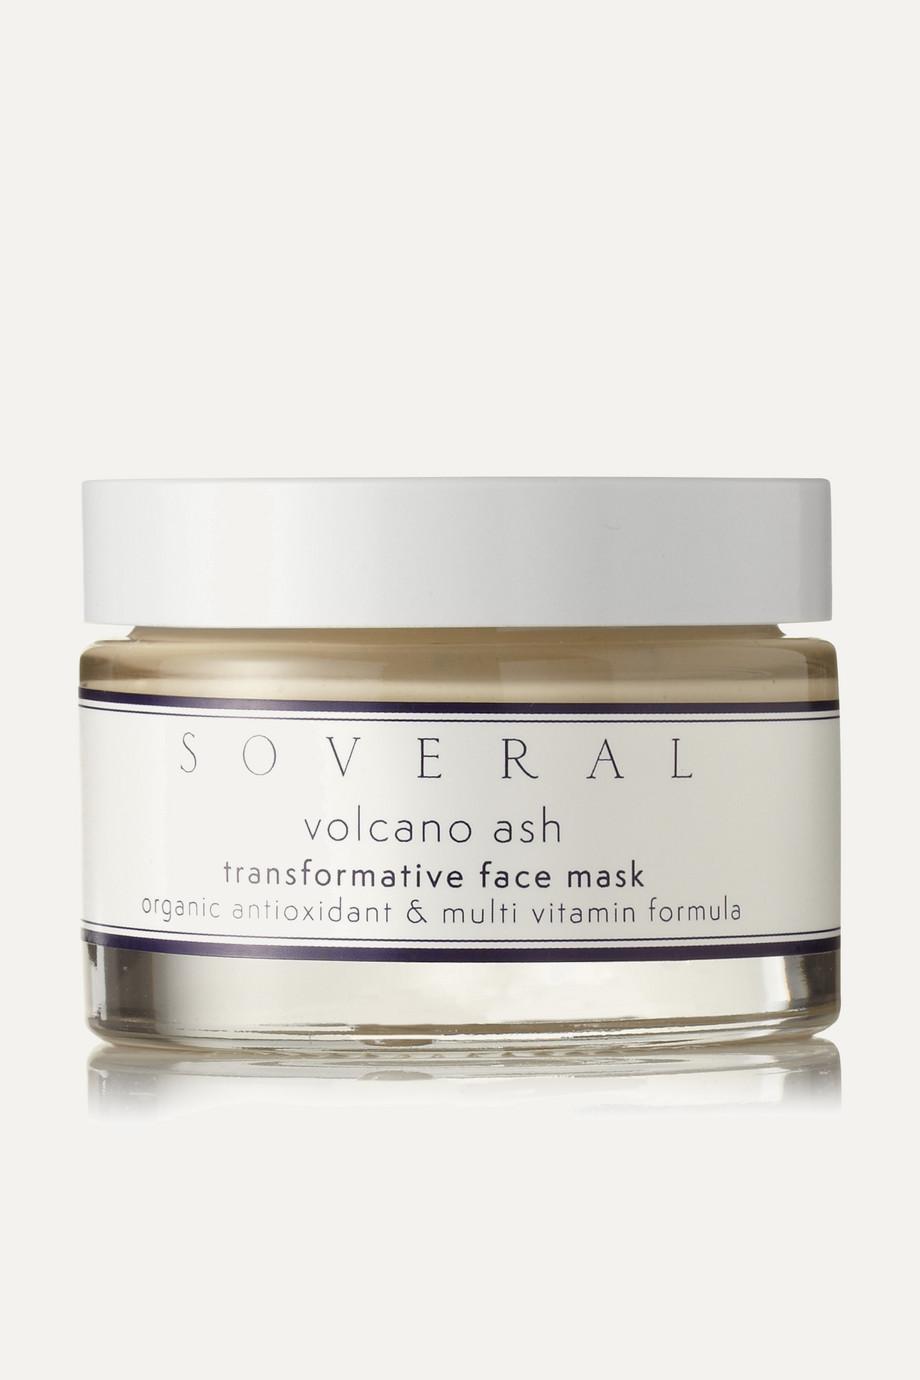 SOVERAL Volcano Ash Transformative Mask, 50ml